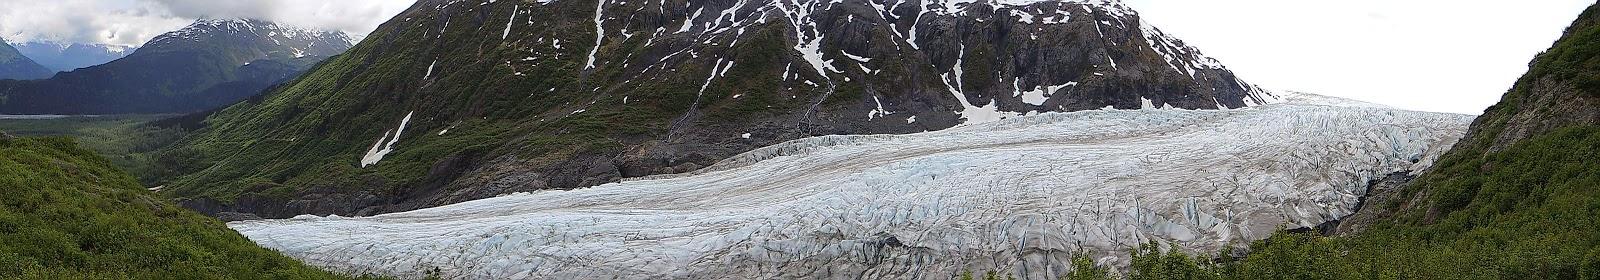 Kenai Fjords National Park 10